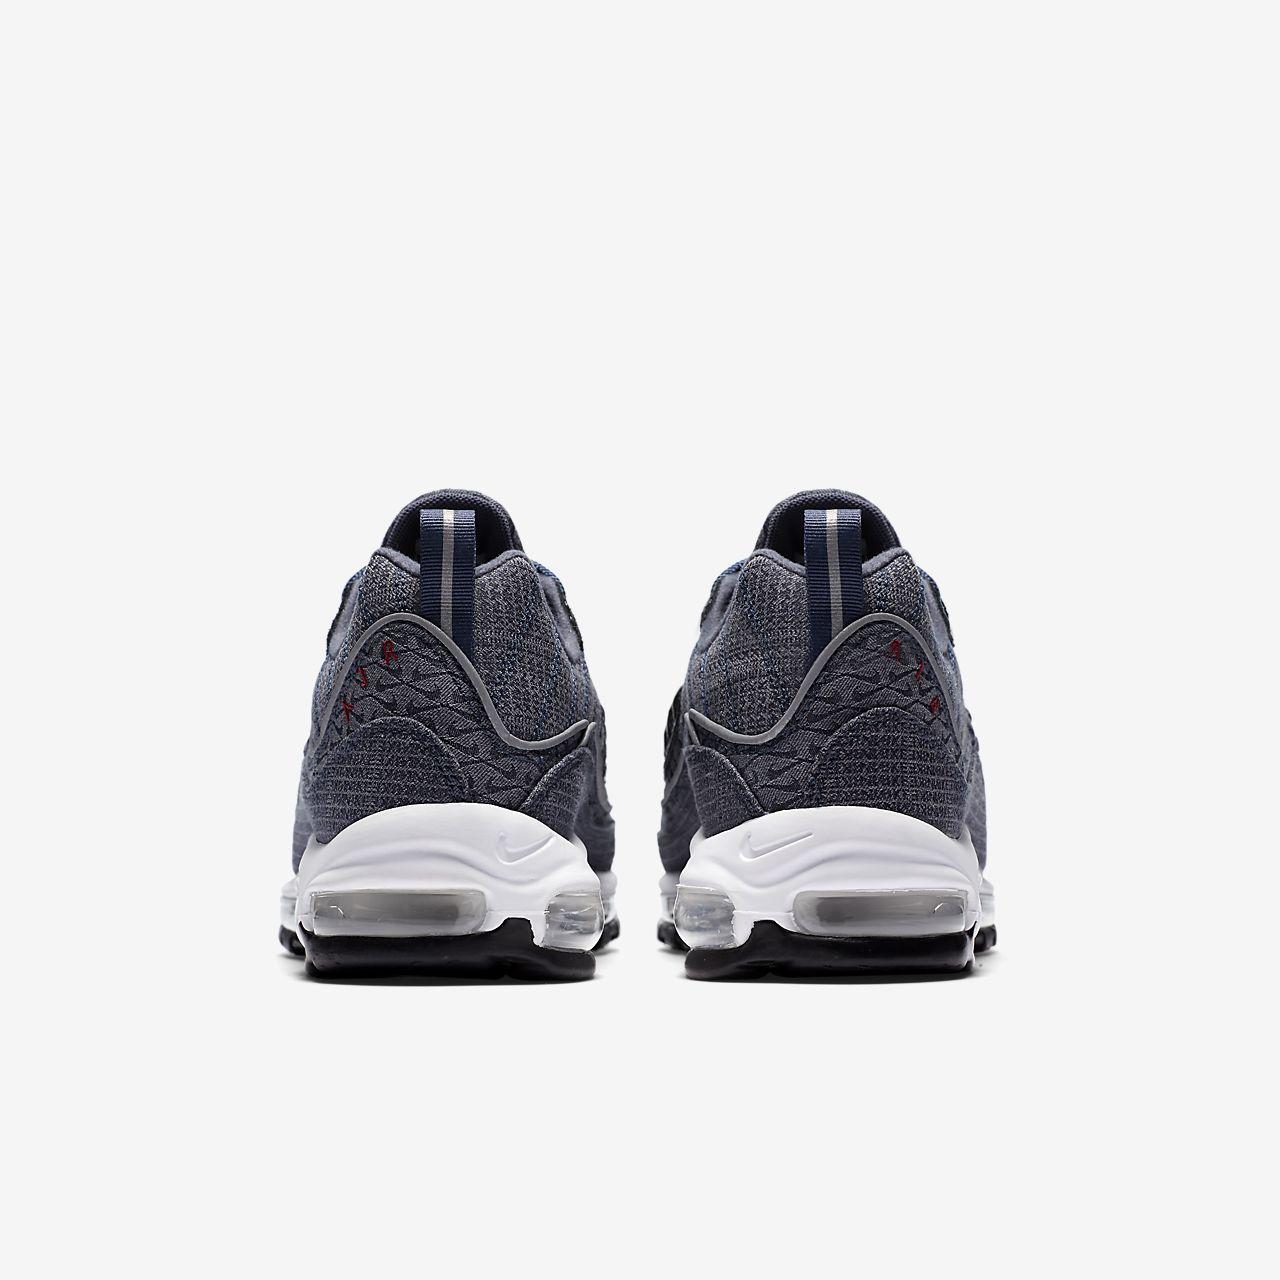 a9e930cc4759a8 Nike Air Max 98 QS Men s Shoe. Nike.com IN